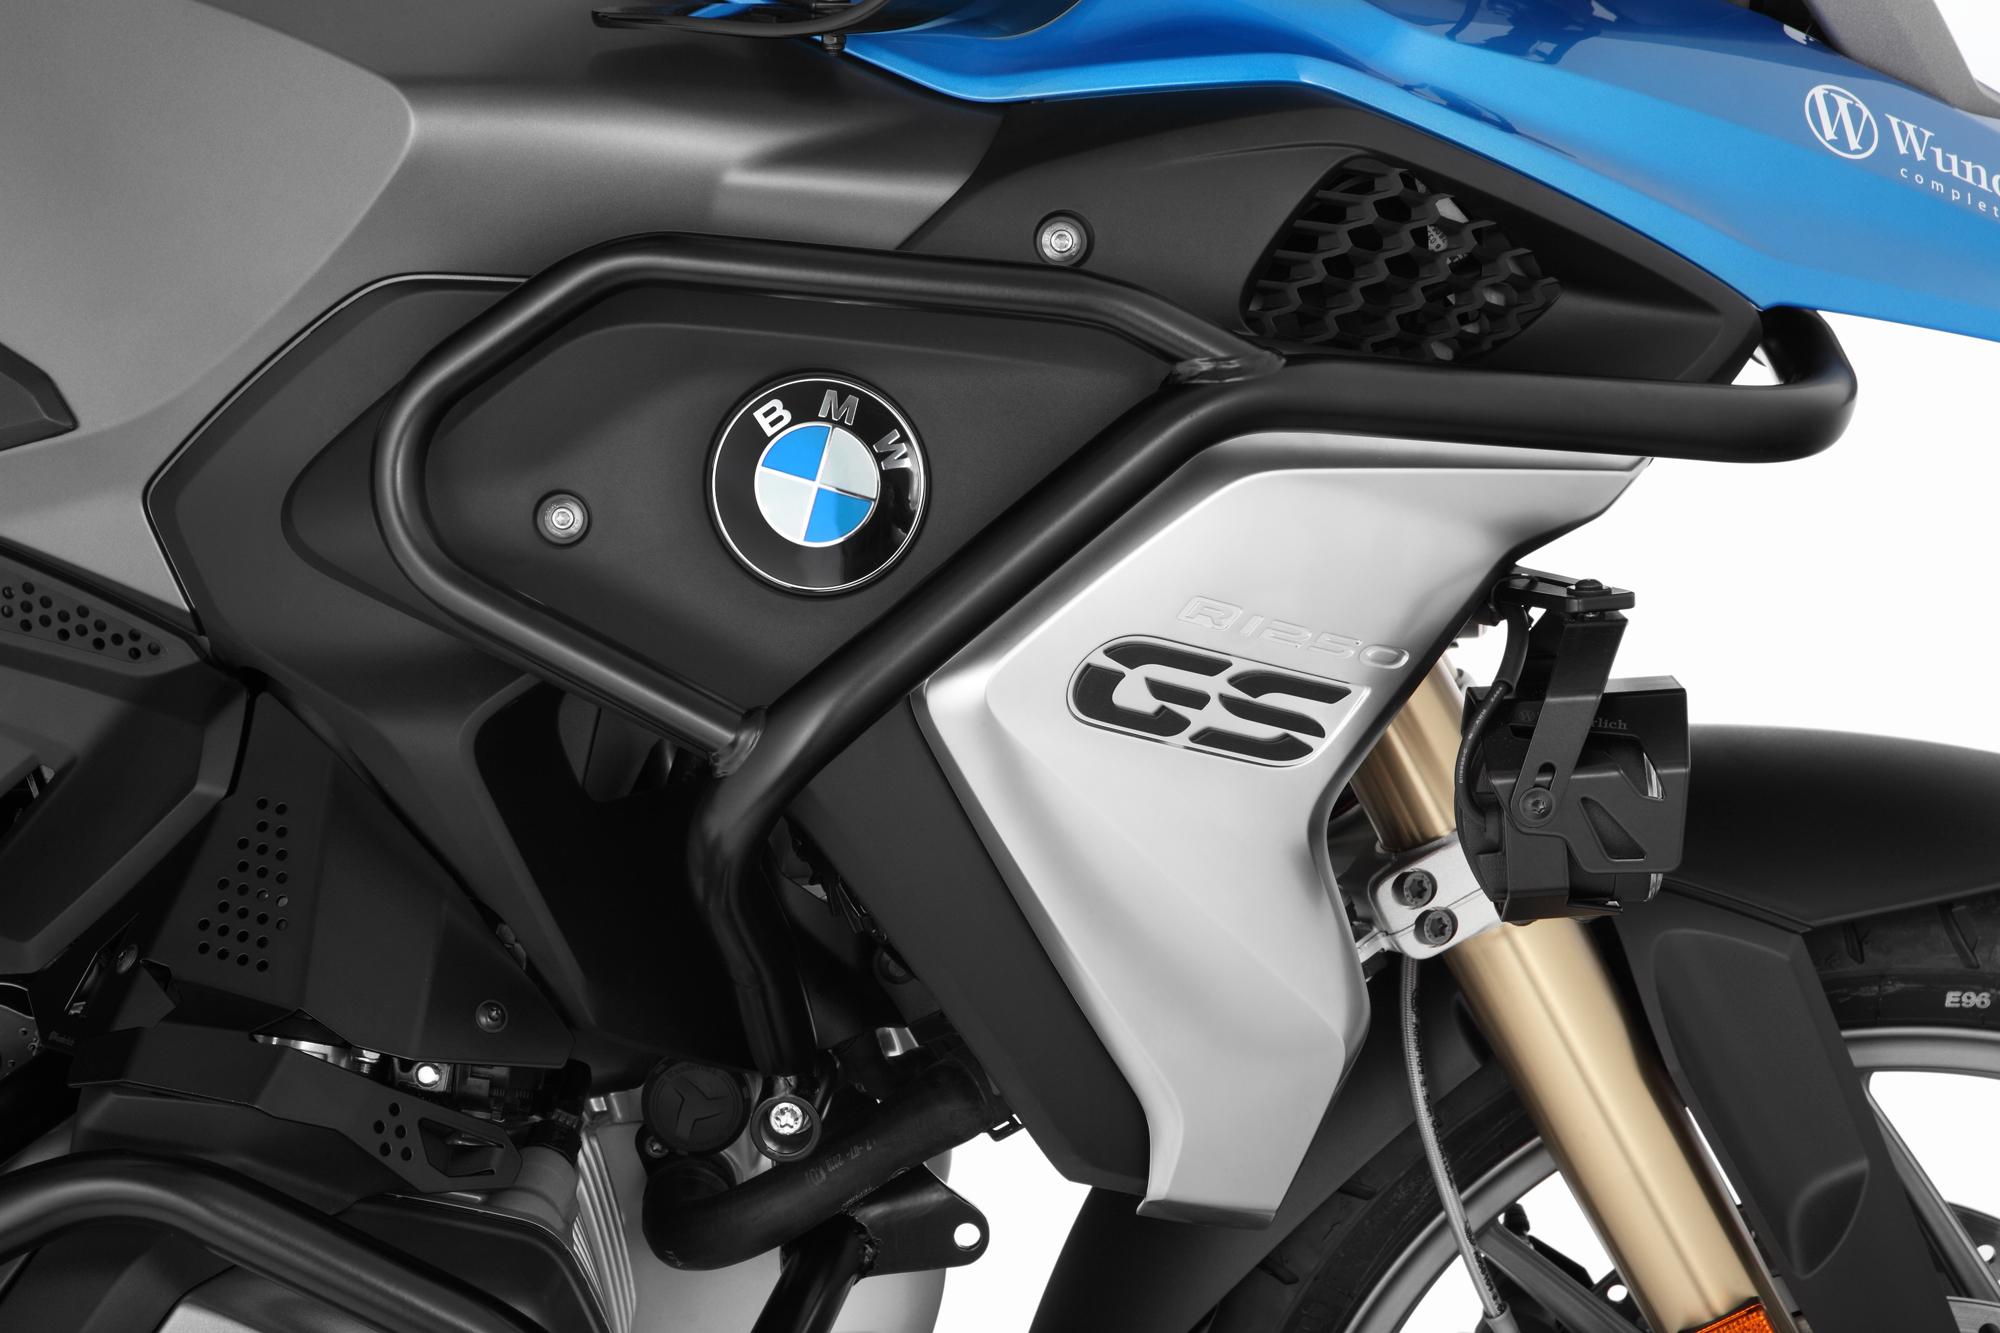 LC Motorrad Motorschutzb/ügel-Schutz-Auto Dekorative Schutz-Block 22-25-28mm Color : R1200GS Black F/ür BMW R1250GS R 1200GS